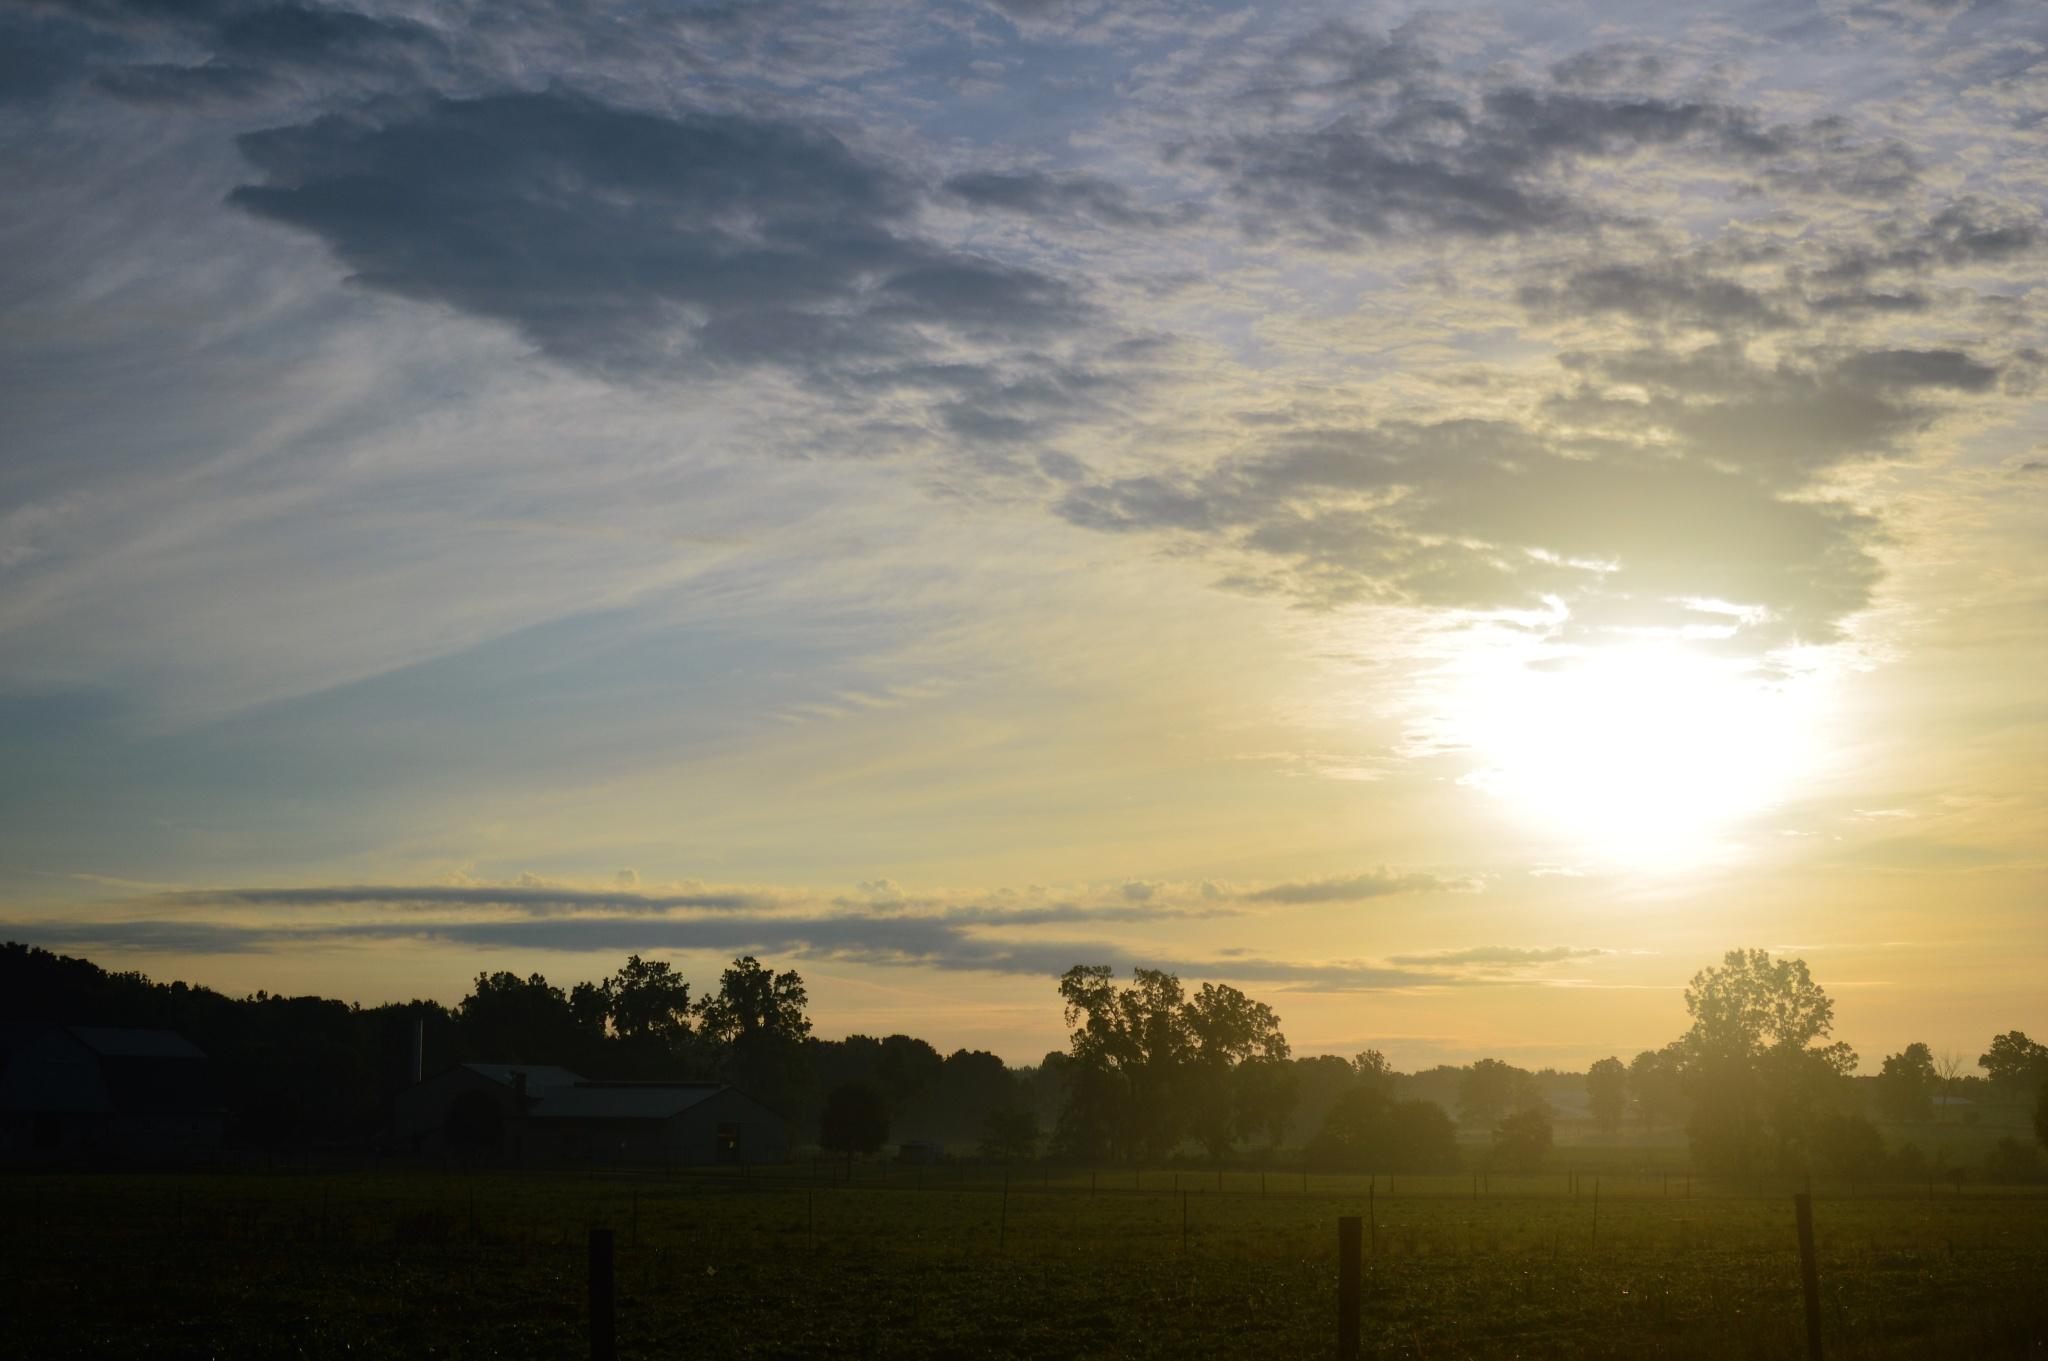 Morning Sun by cindy.martin.7503